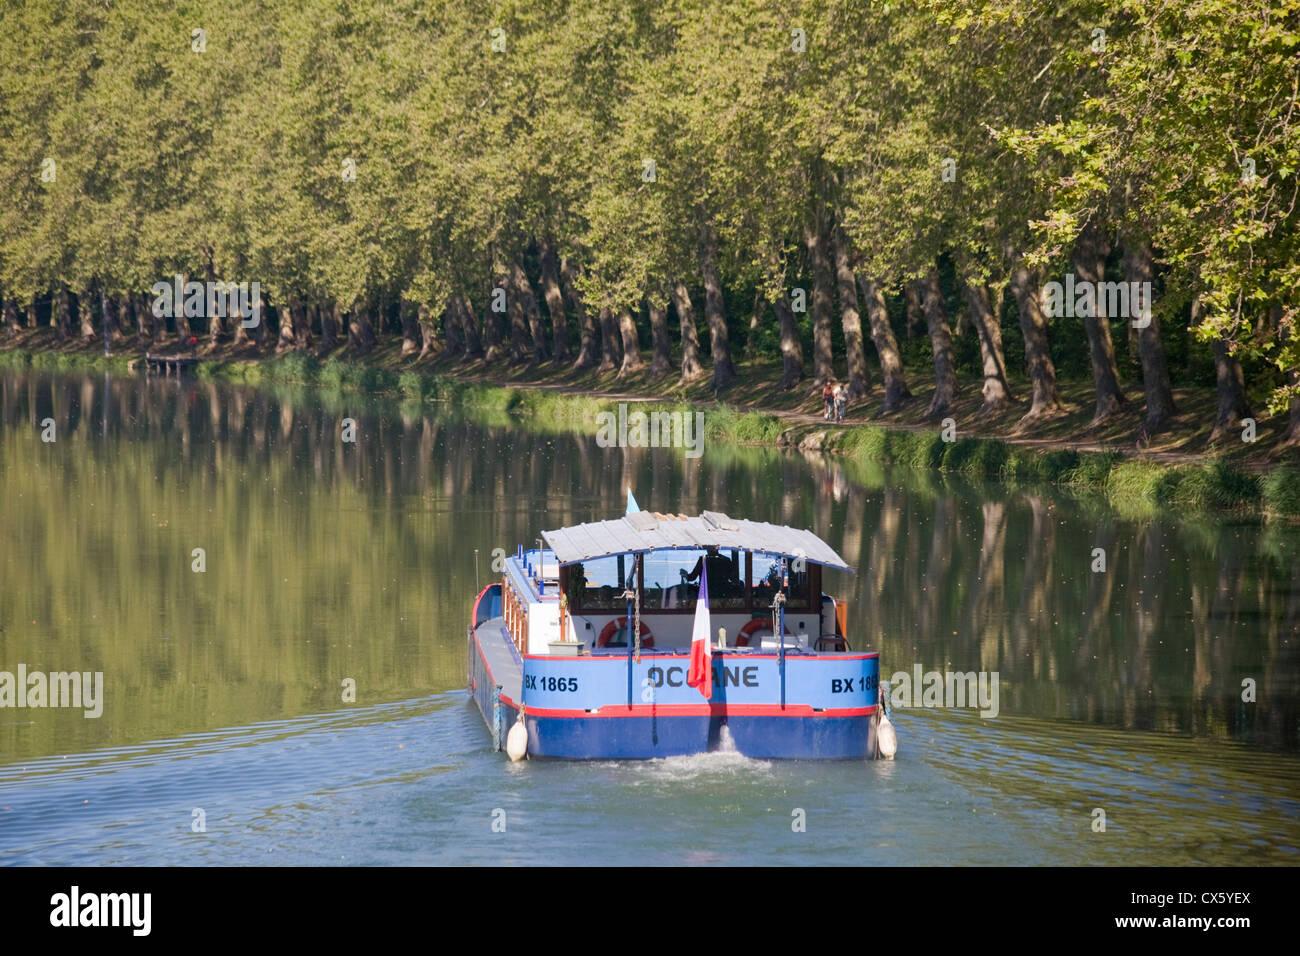 Canal Lateral a la Garonne (Canal du Midi) near Castets en Dorthe, Gironde, France - Stock Image